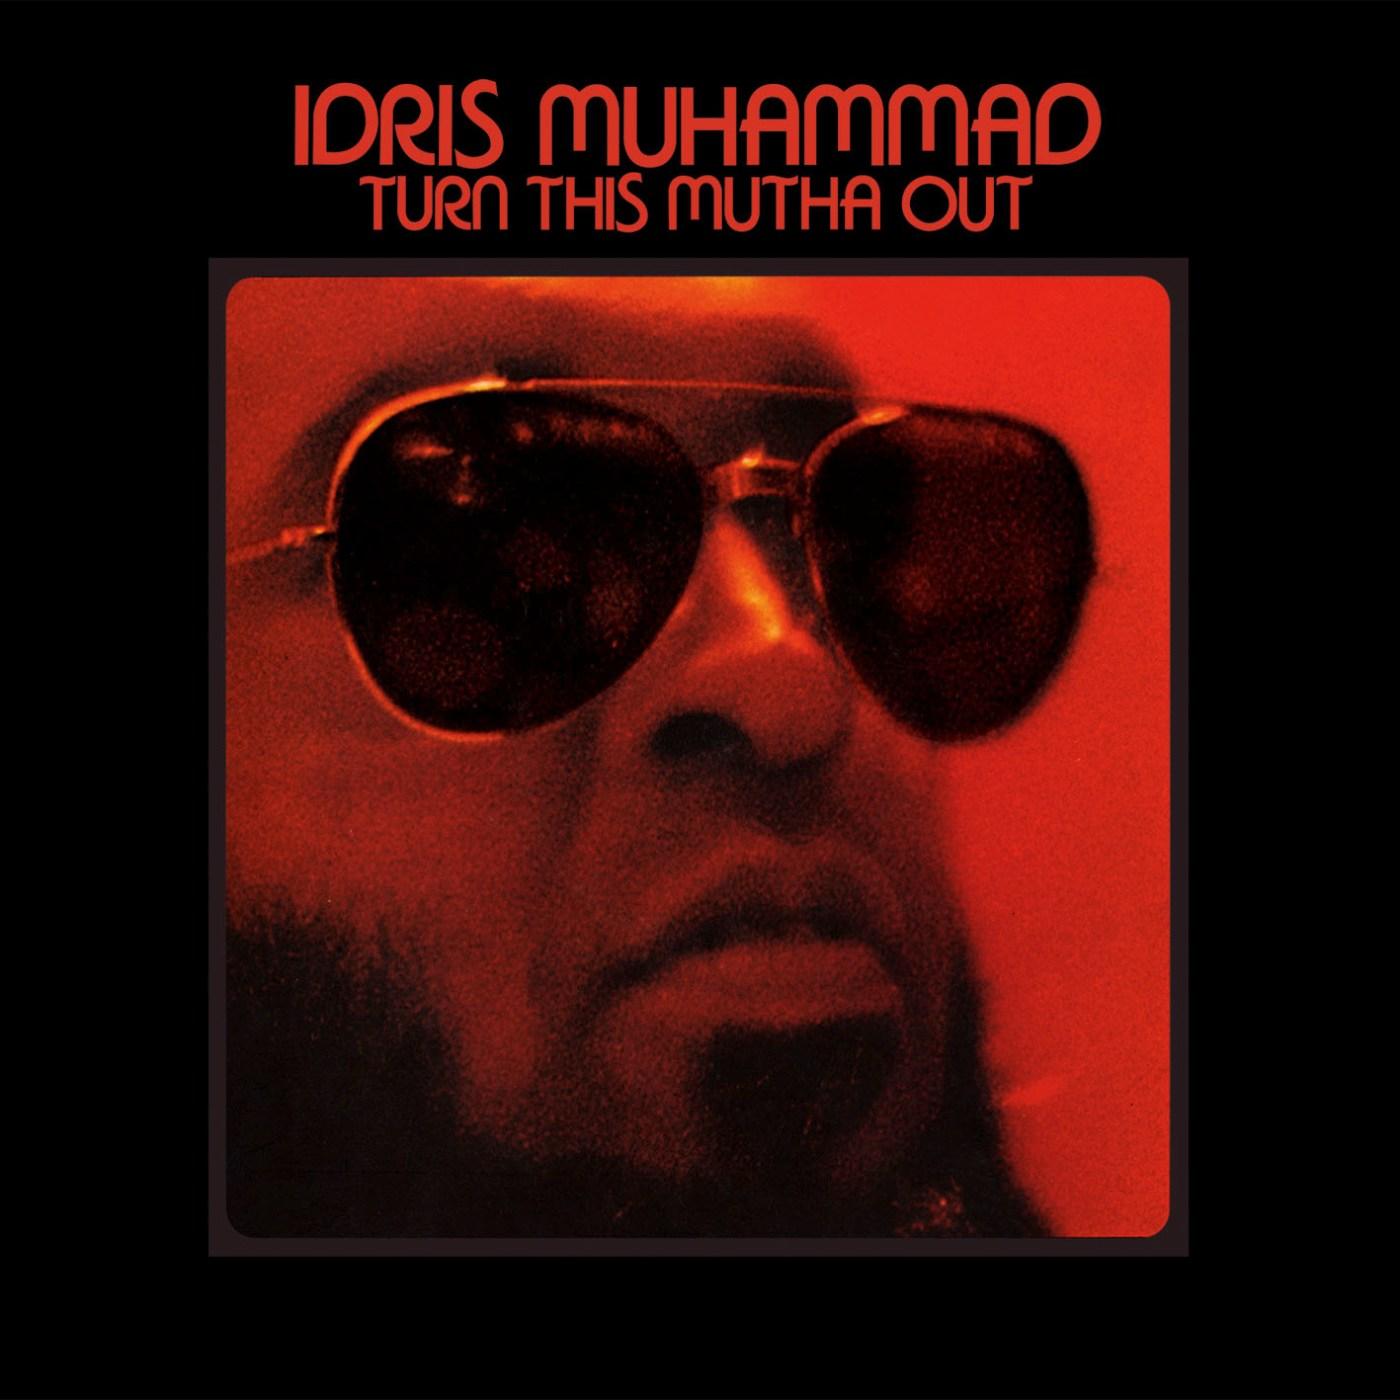 Idris Muhammad/TURN THIS MUTHA OUT CD